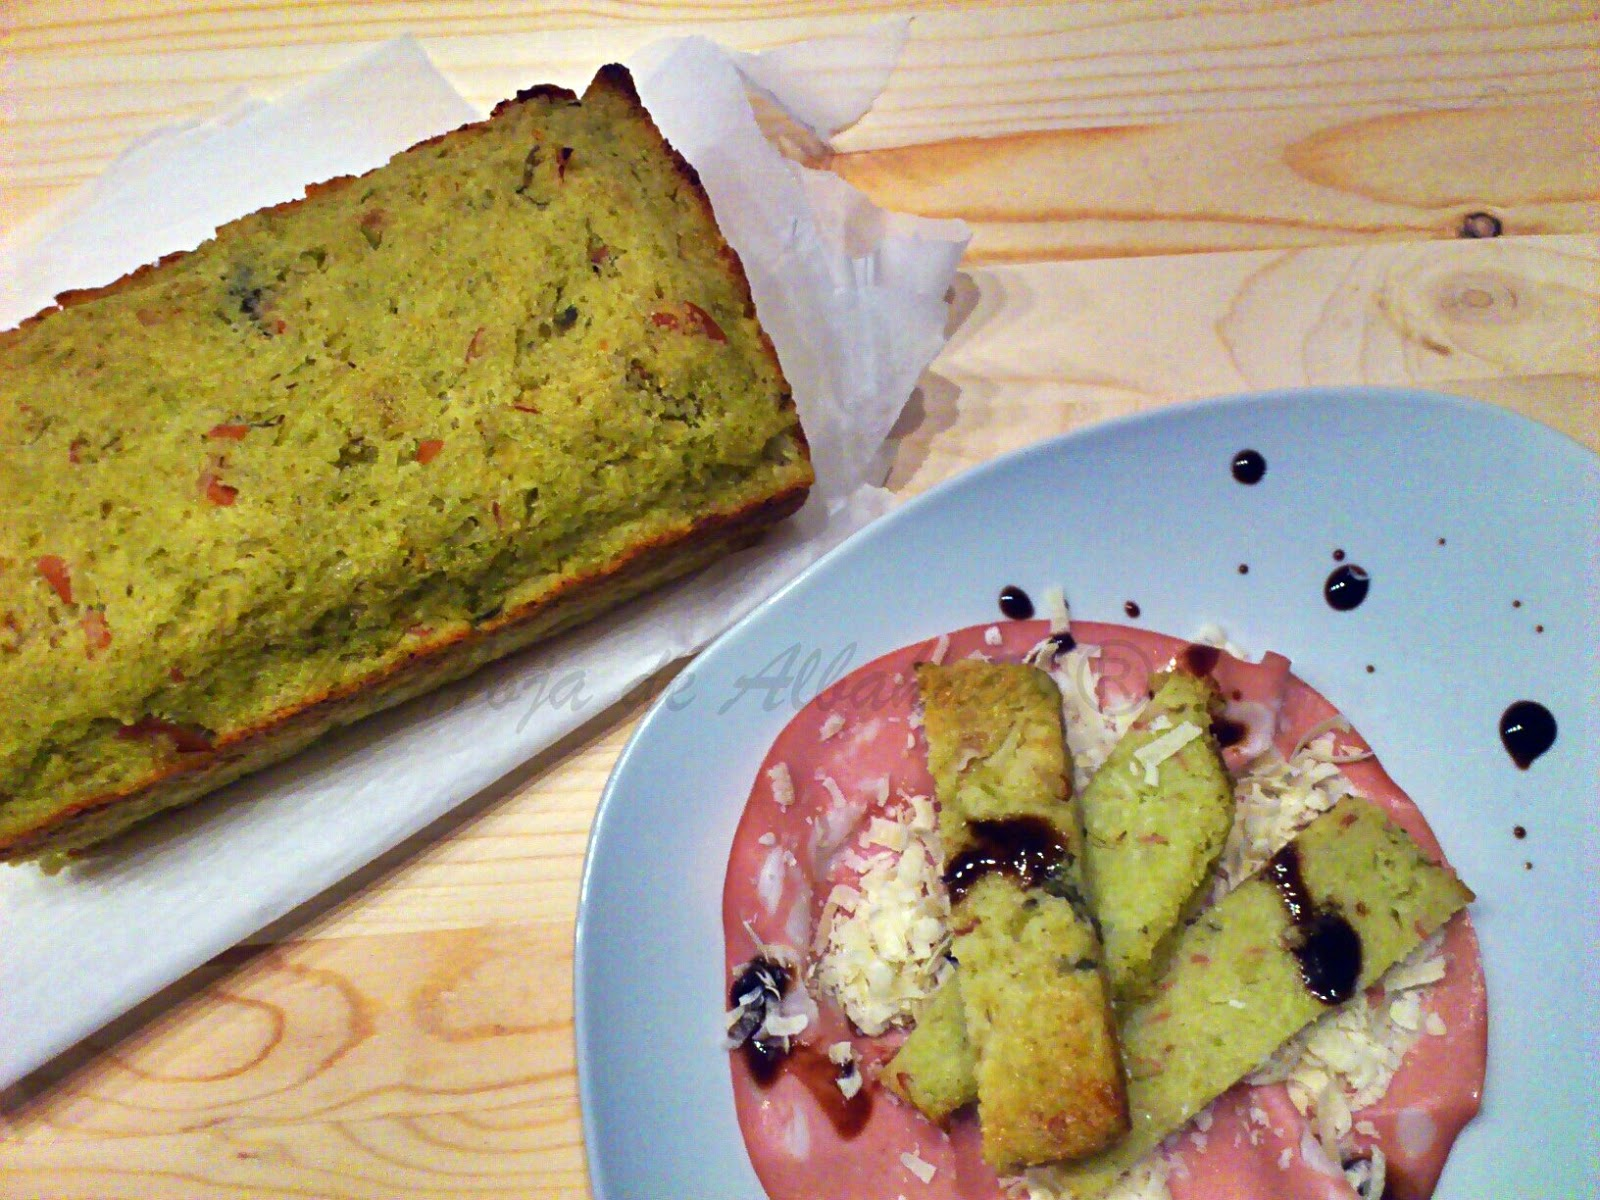 Pastel de brócoli romanesco, gelatina de vinagre de Módena,harina de semola de trigo duro, alcaparras, brócoli romanesco